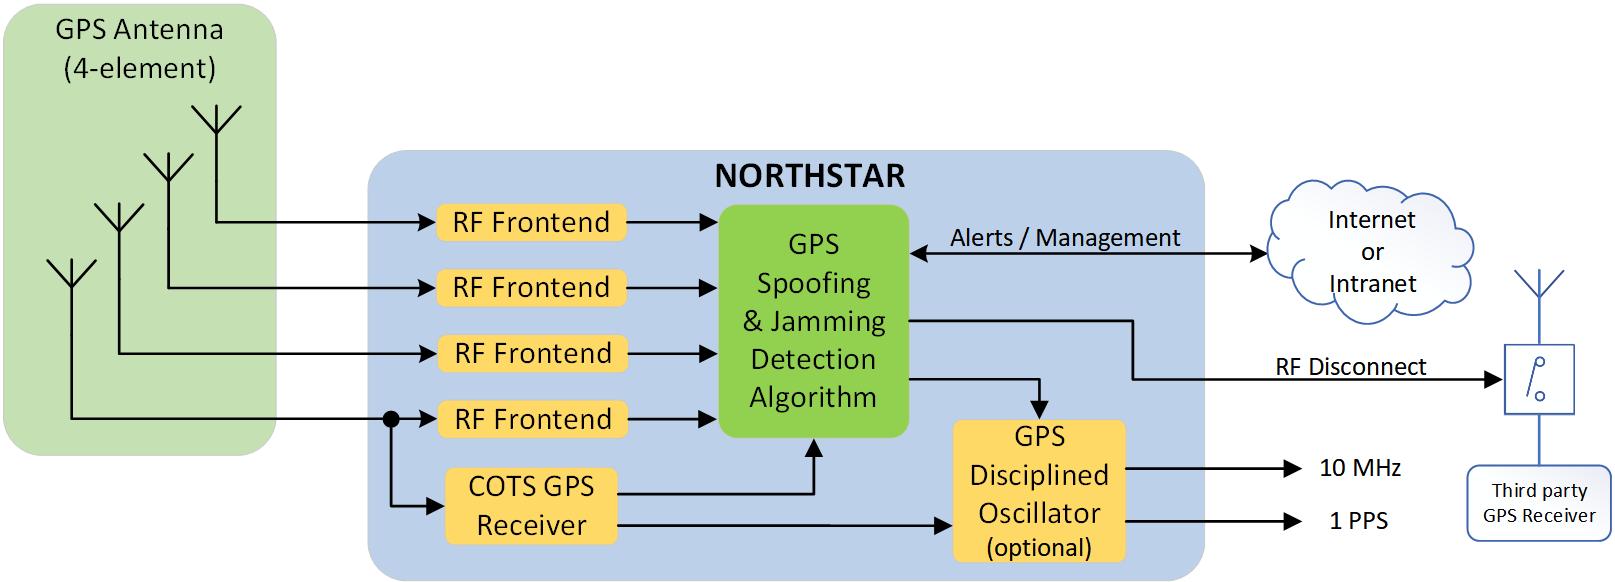 Northstar Block Diagram